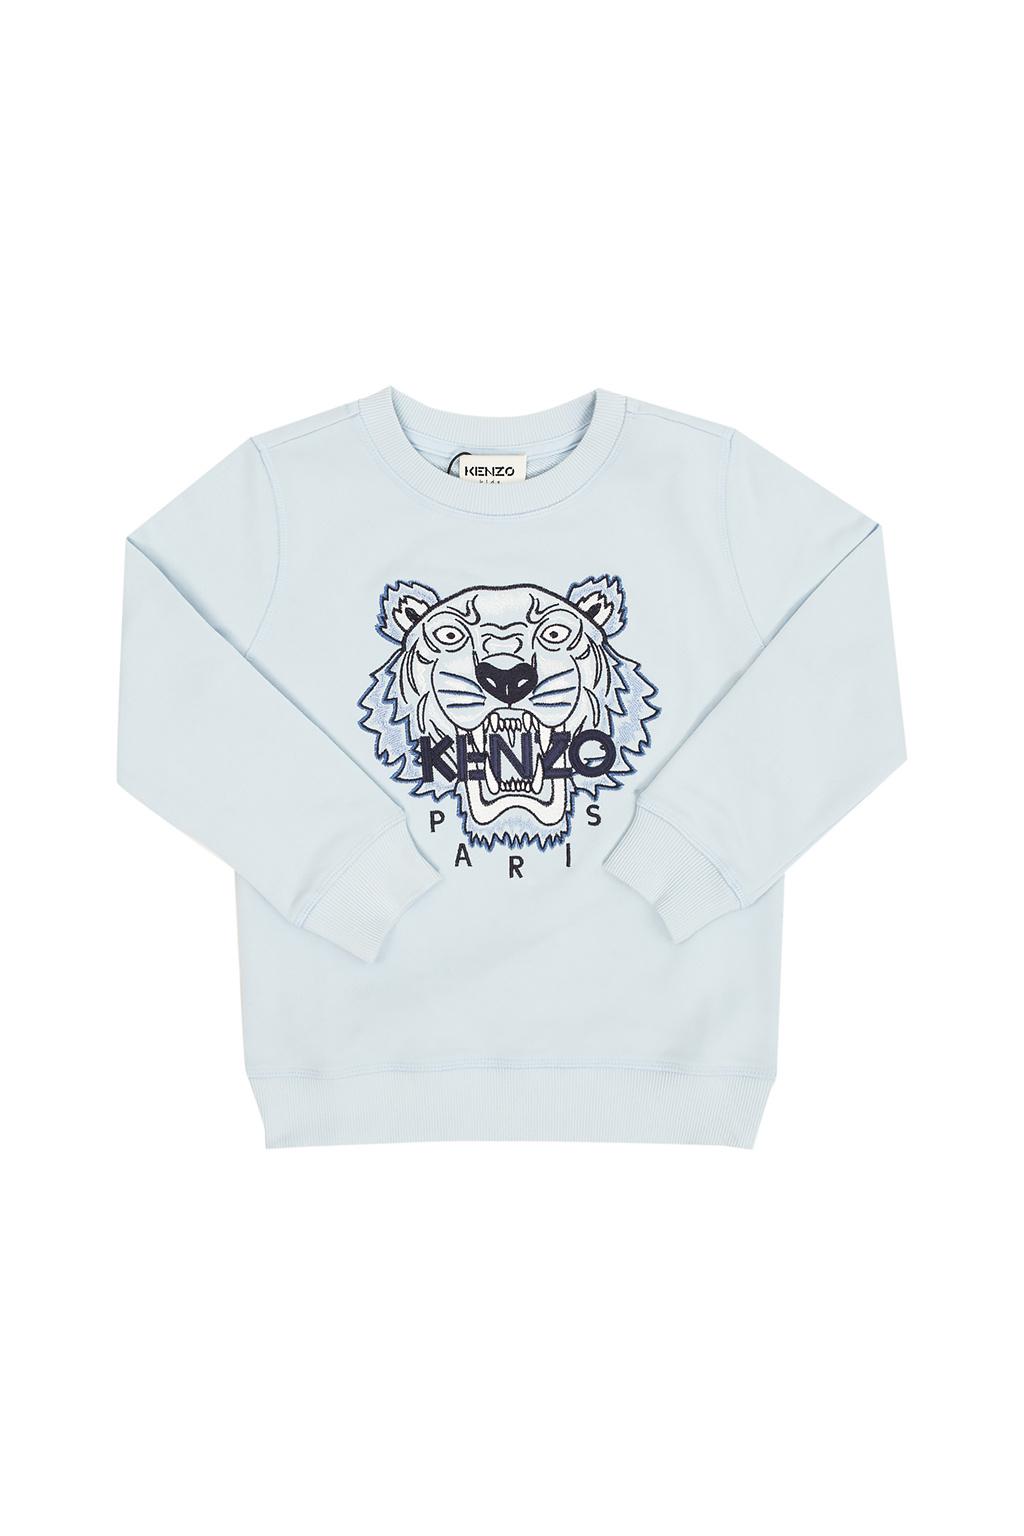 Kenzo Kids Sweatshirt with tiger head